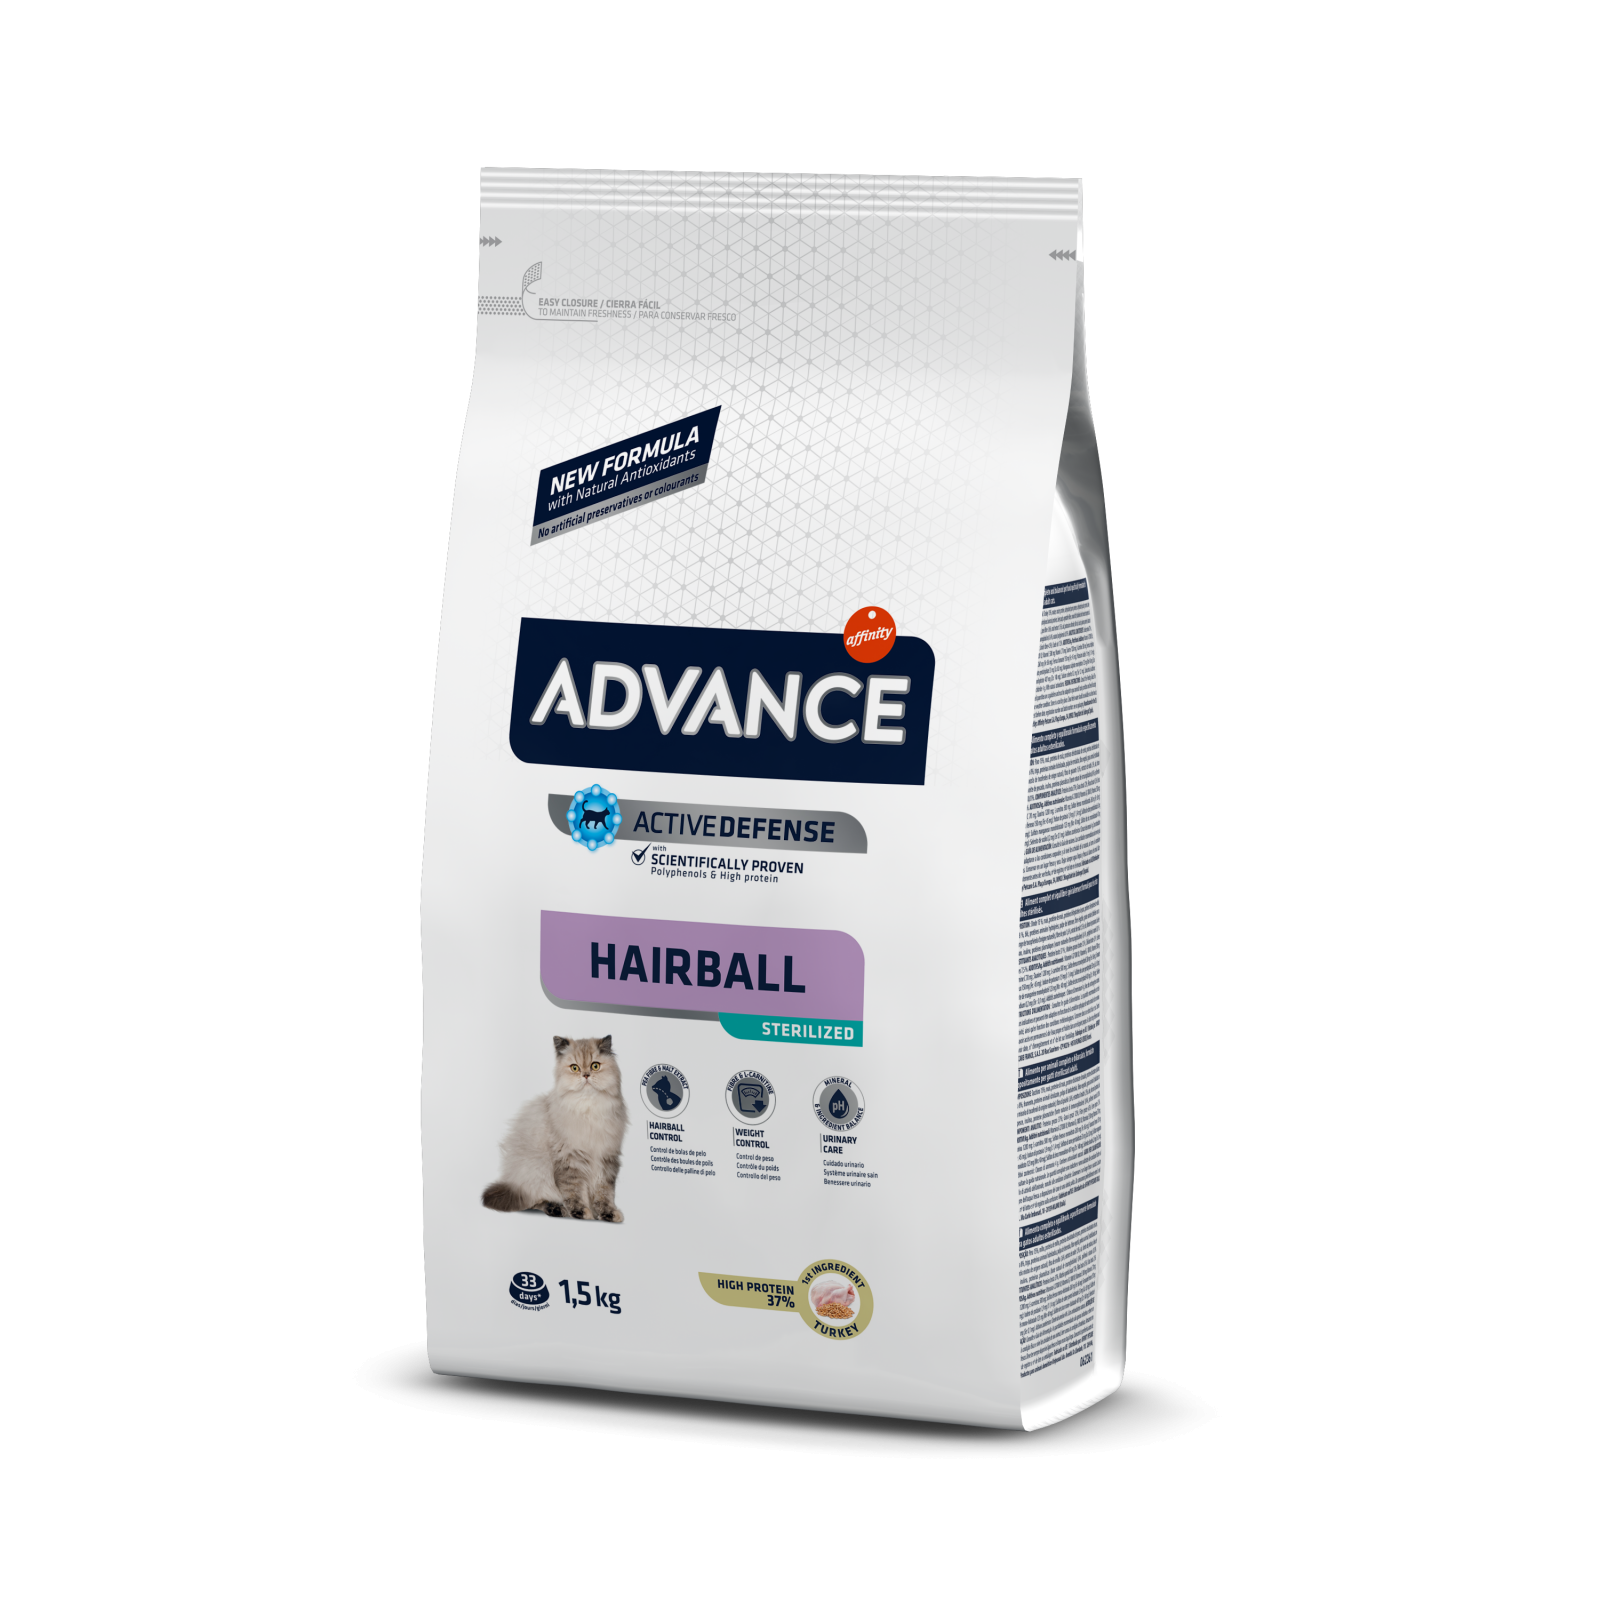 Advance Cat Sterilizat Hairball, 1.5 kg